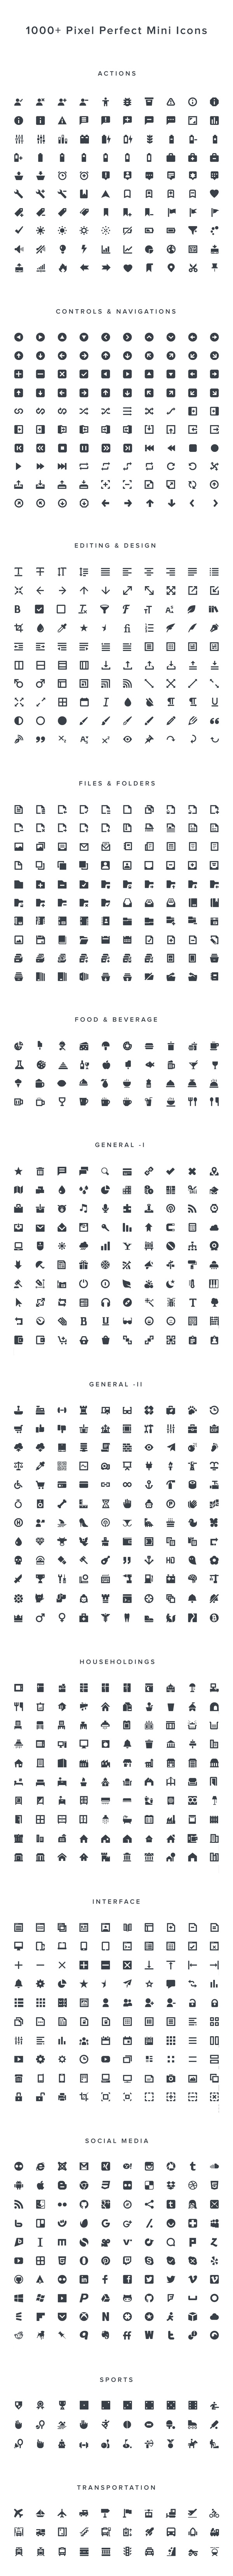 Squid Ink: 1000 Free Mini Icons   GraphicBurger